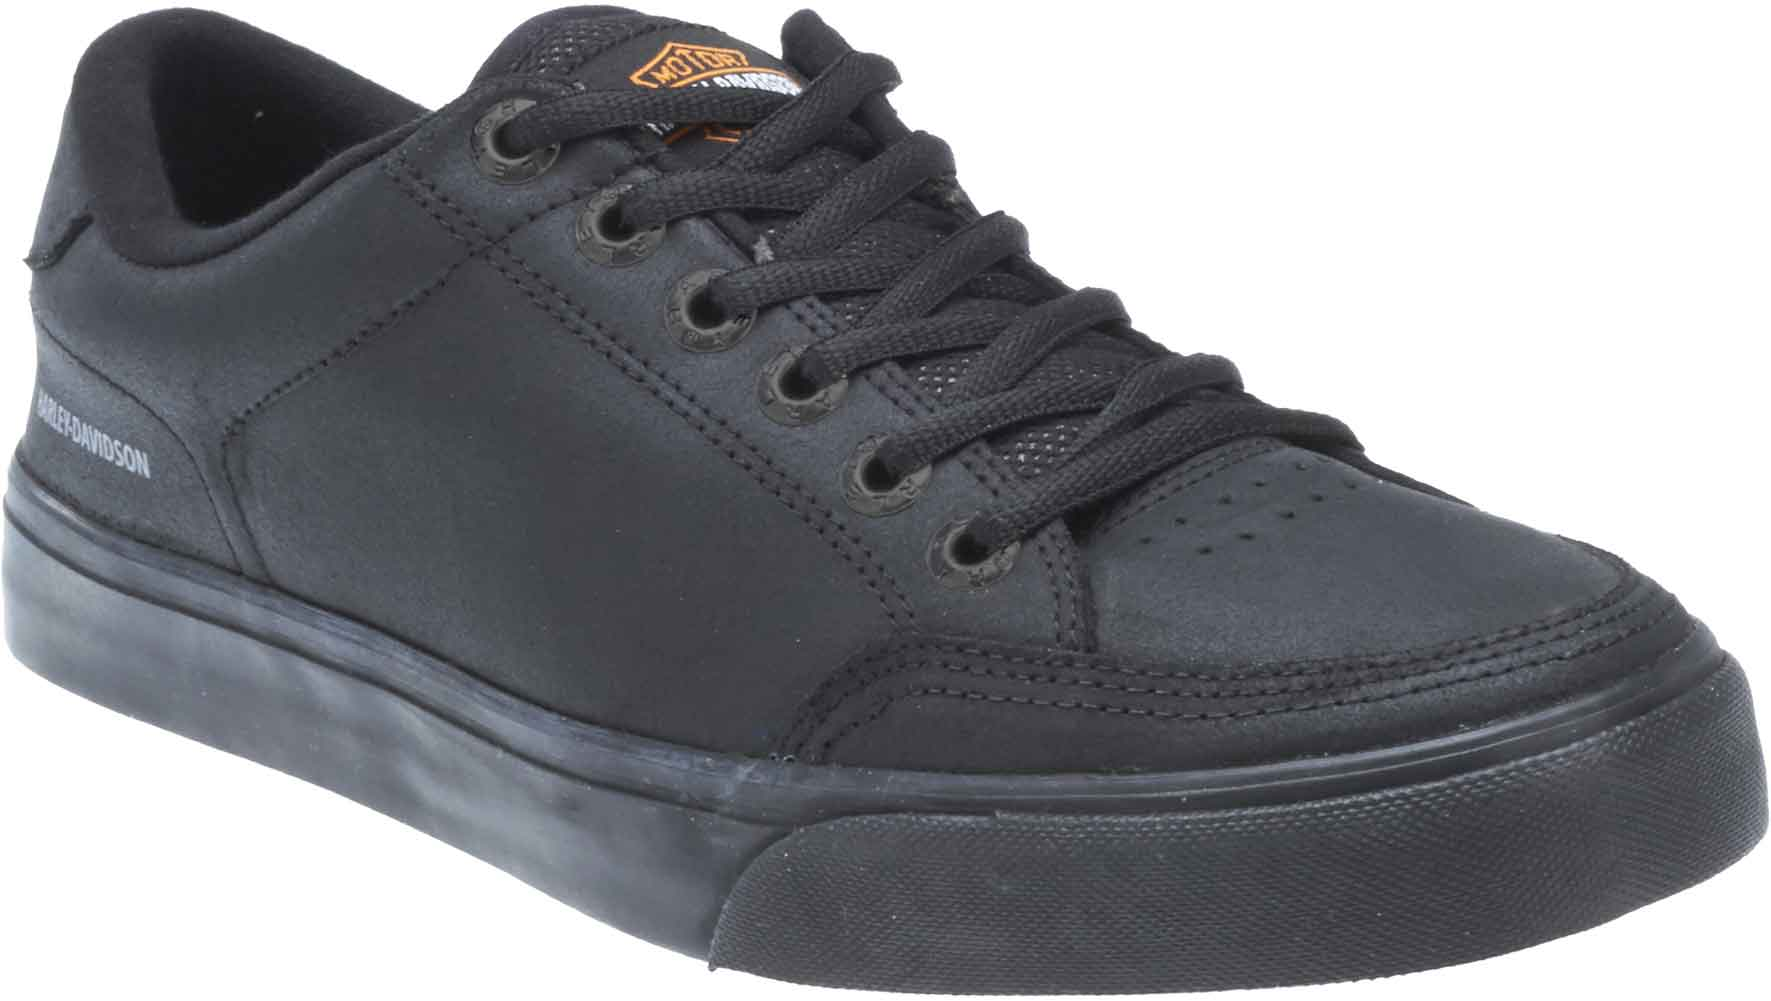 3dc59b901c18 Details about Harley-Davidson Men s Bando Black Leather Shoes   Sneakers.  D93330